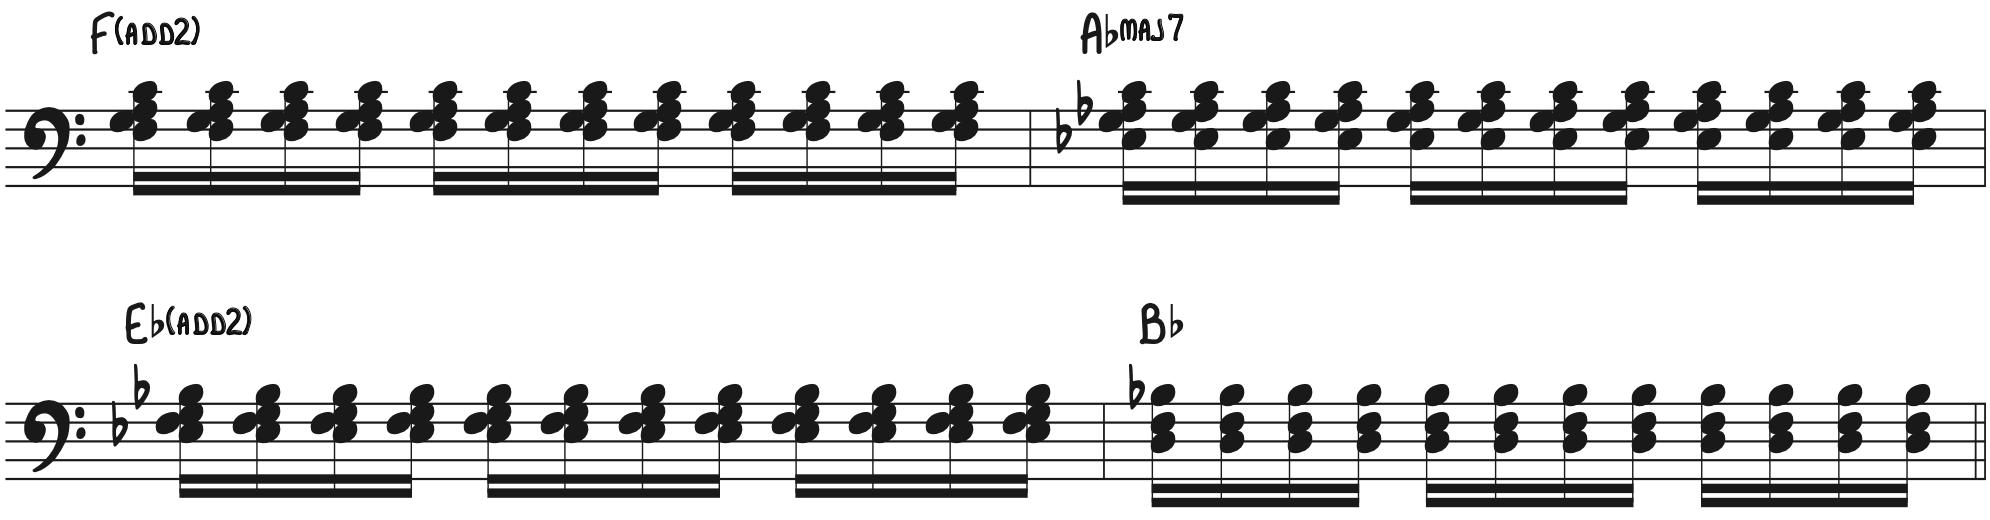 Hans Zimmer Piano Accompaniment for impov improvisation